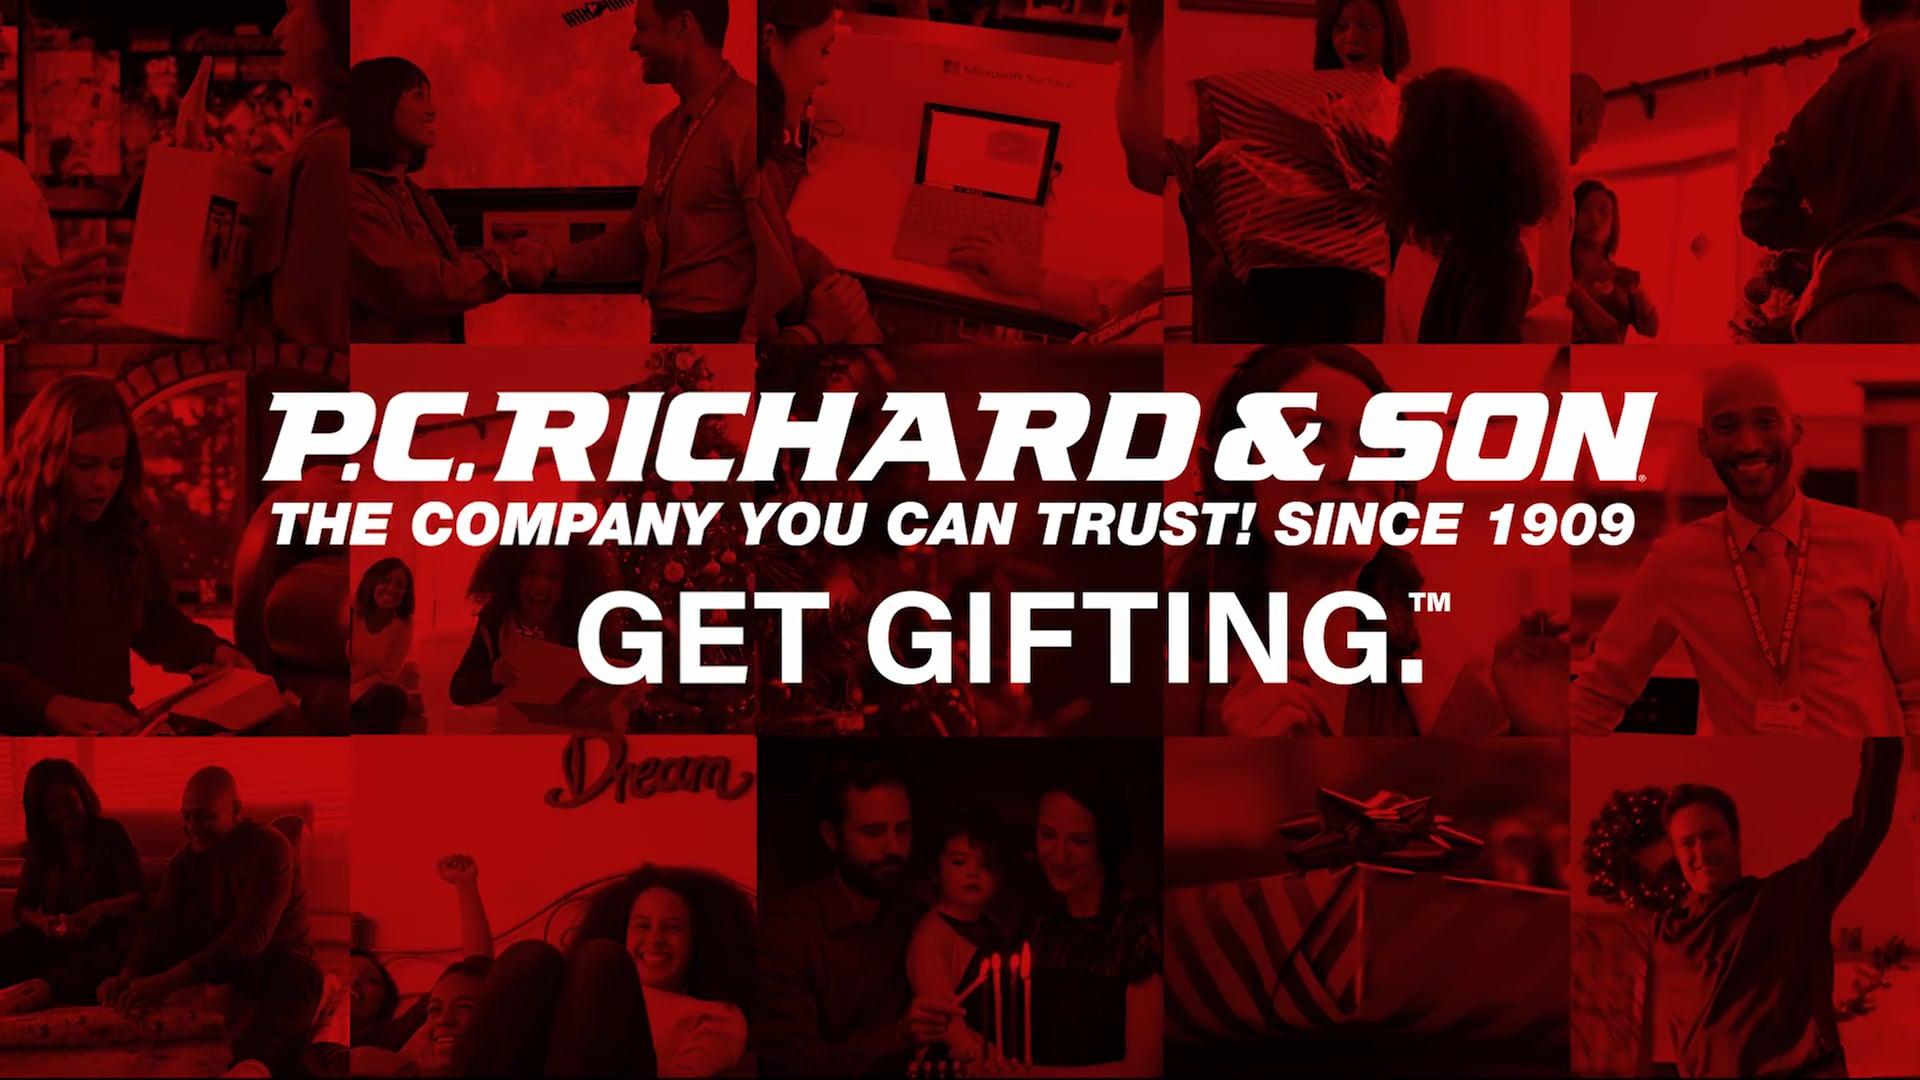 PC Richard & Sons - Get Gifting :30